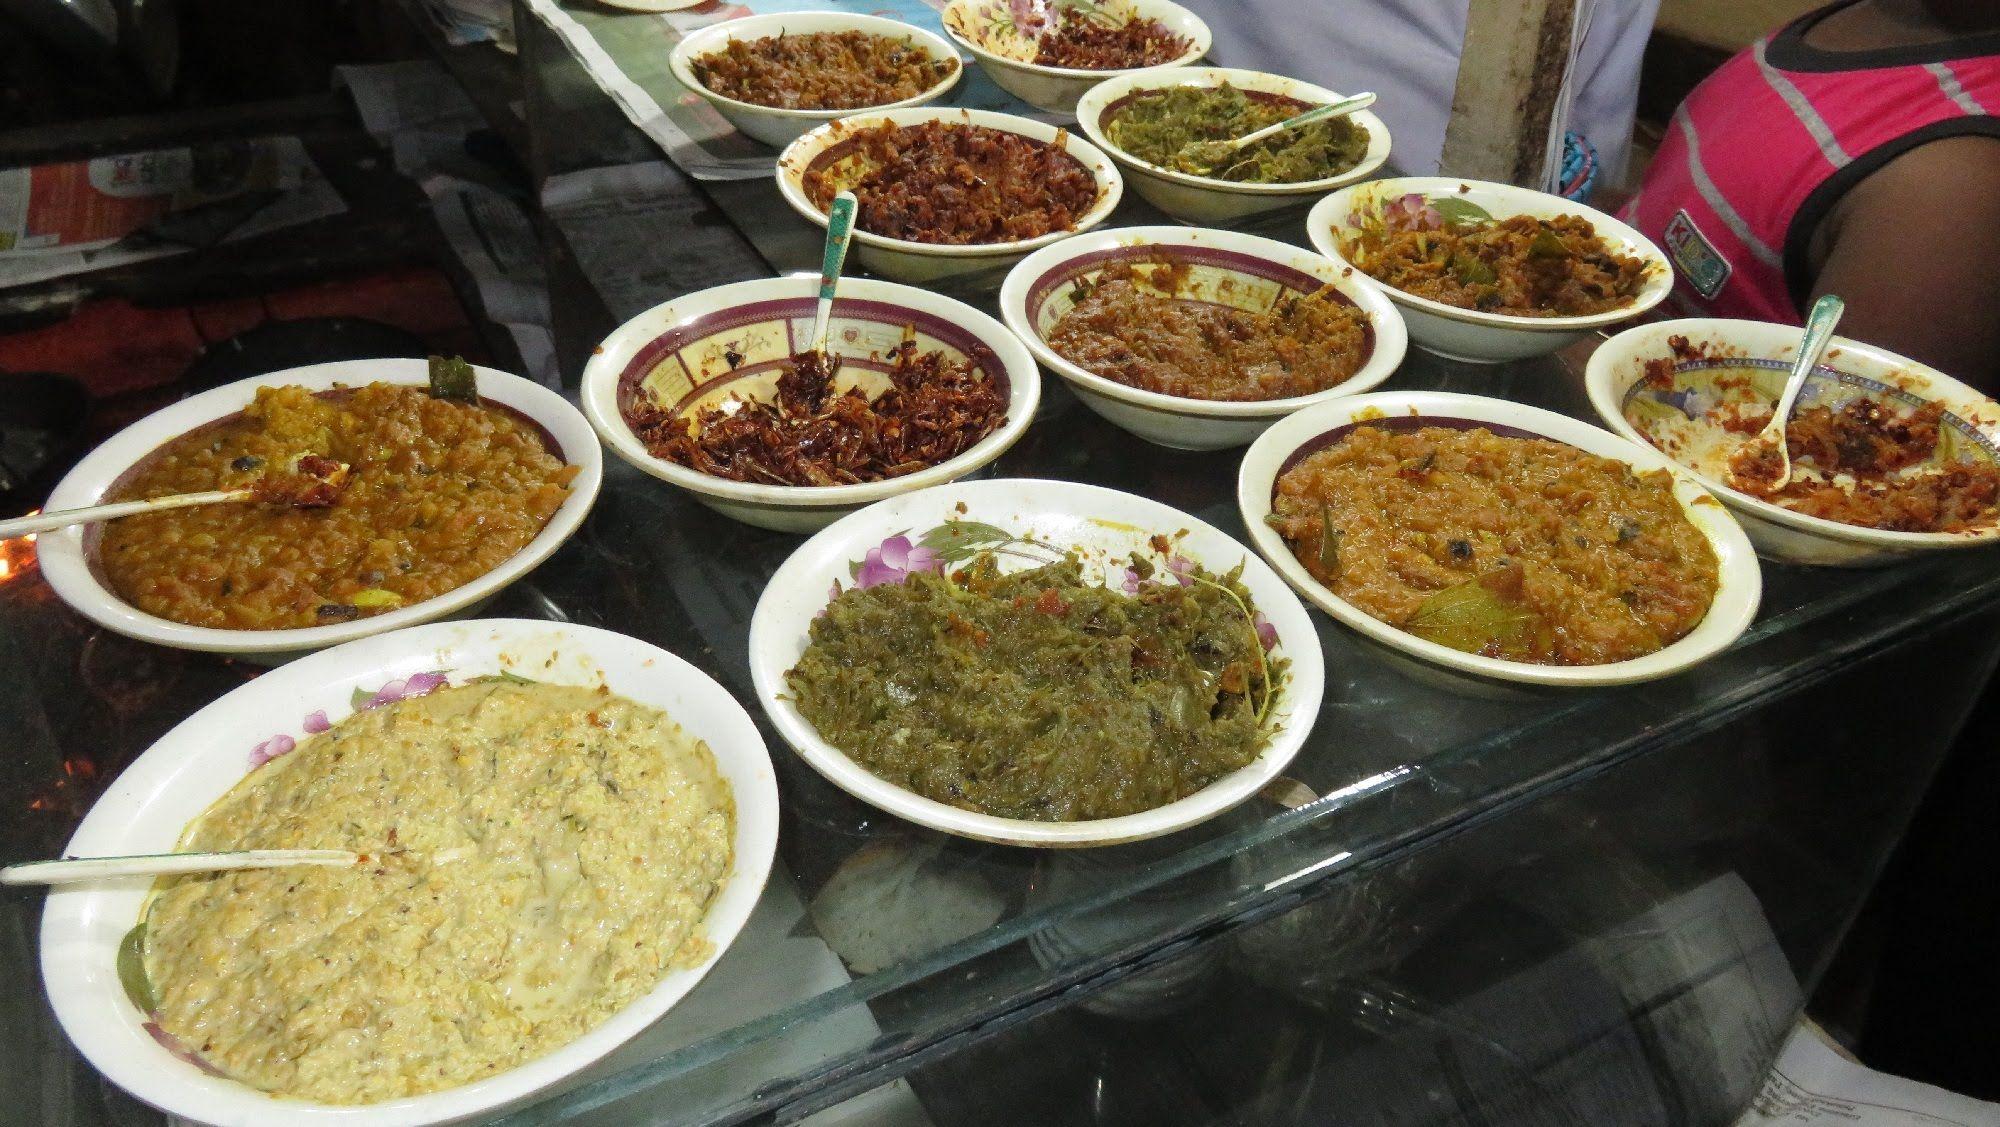 Street food of dhaka bangladesh part 2 bengalifood64 recipes street food of dhaka bangladesh part 2 bengalifood64 forumfinder Gallery